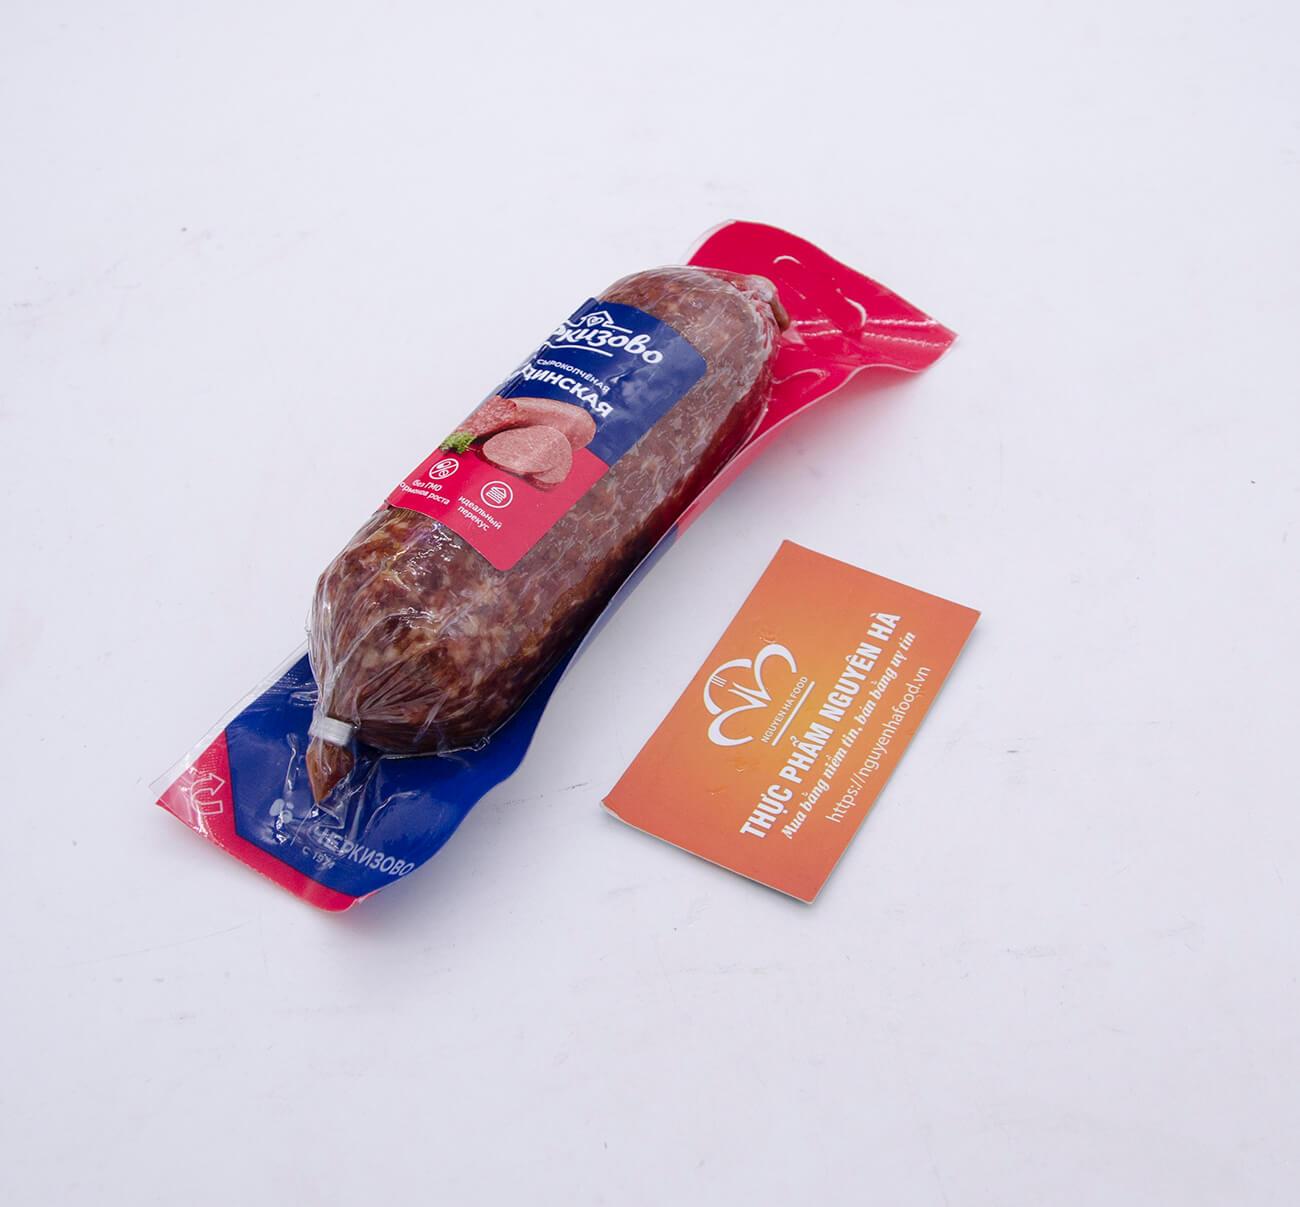 Giò salami hun khói